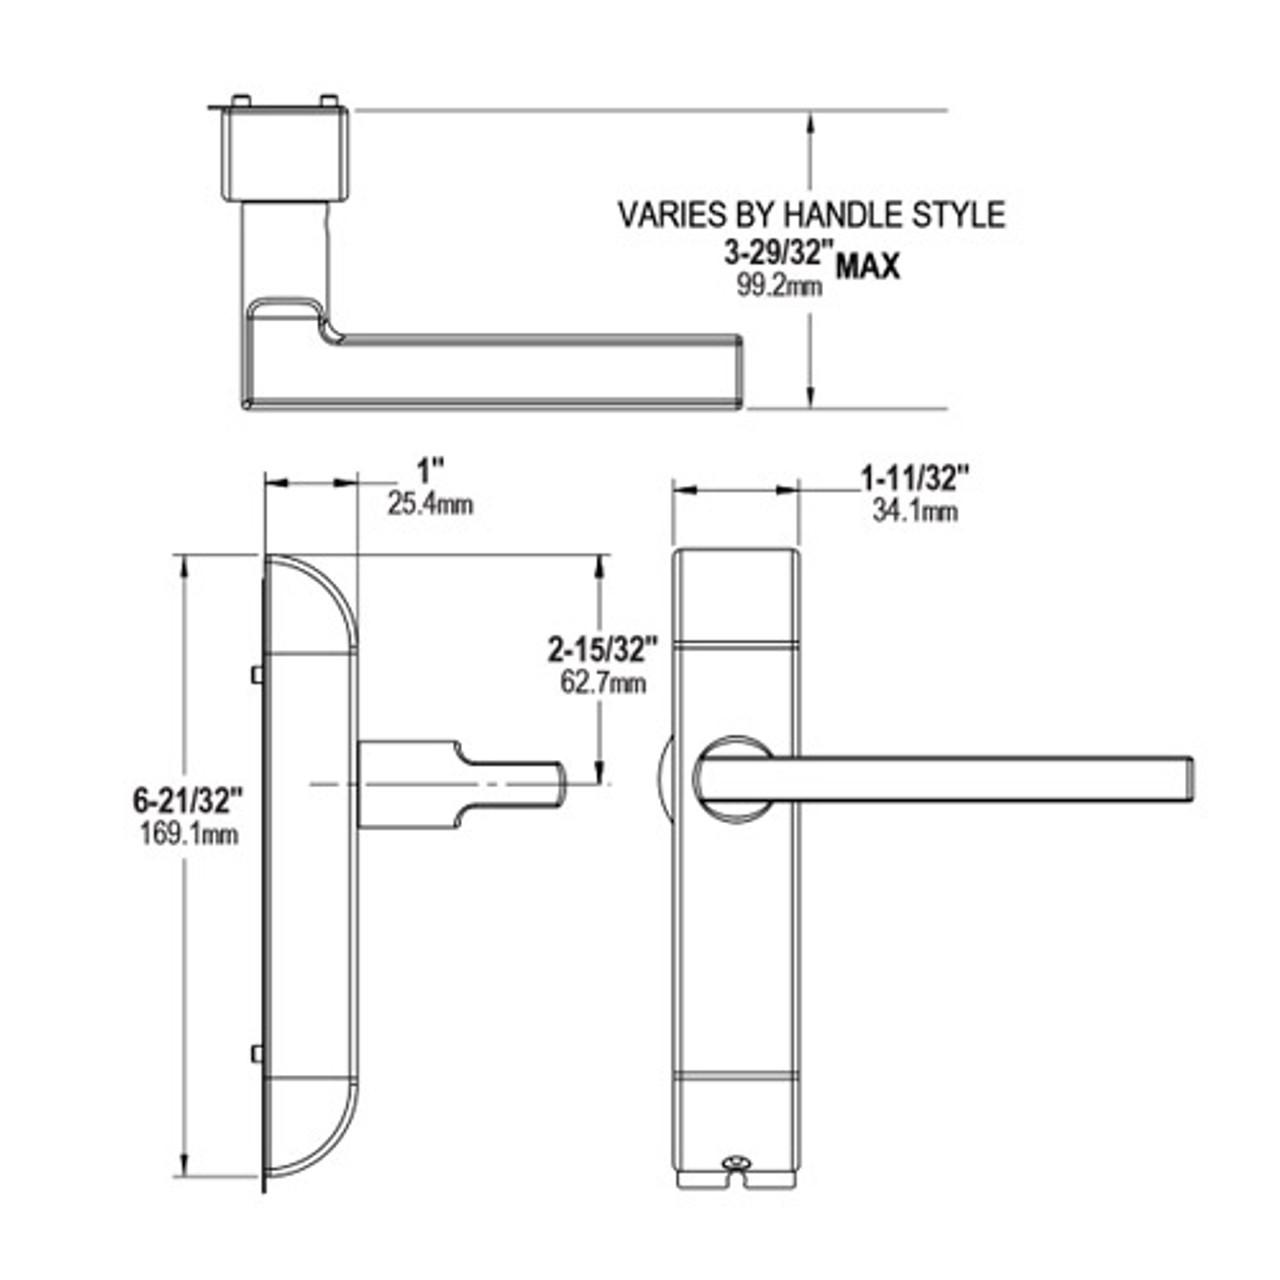 4600-MI-612-US4 Adams Rite MI Designer handle Dimensional View